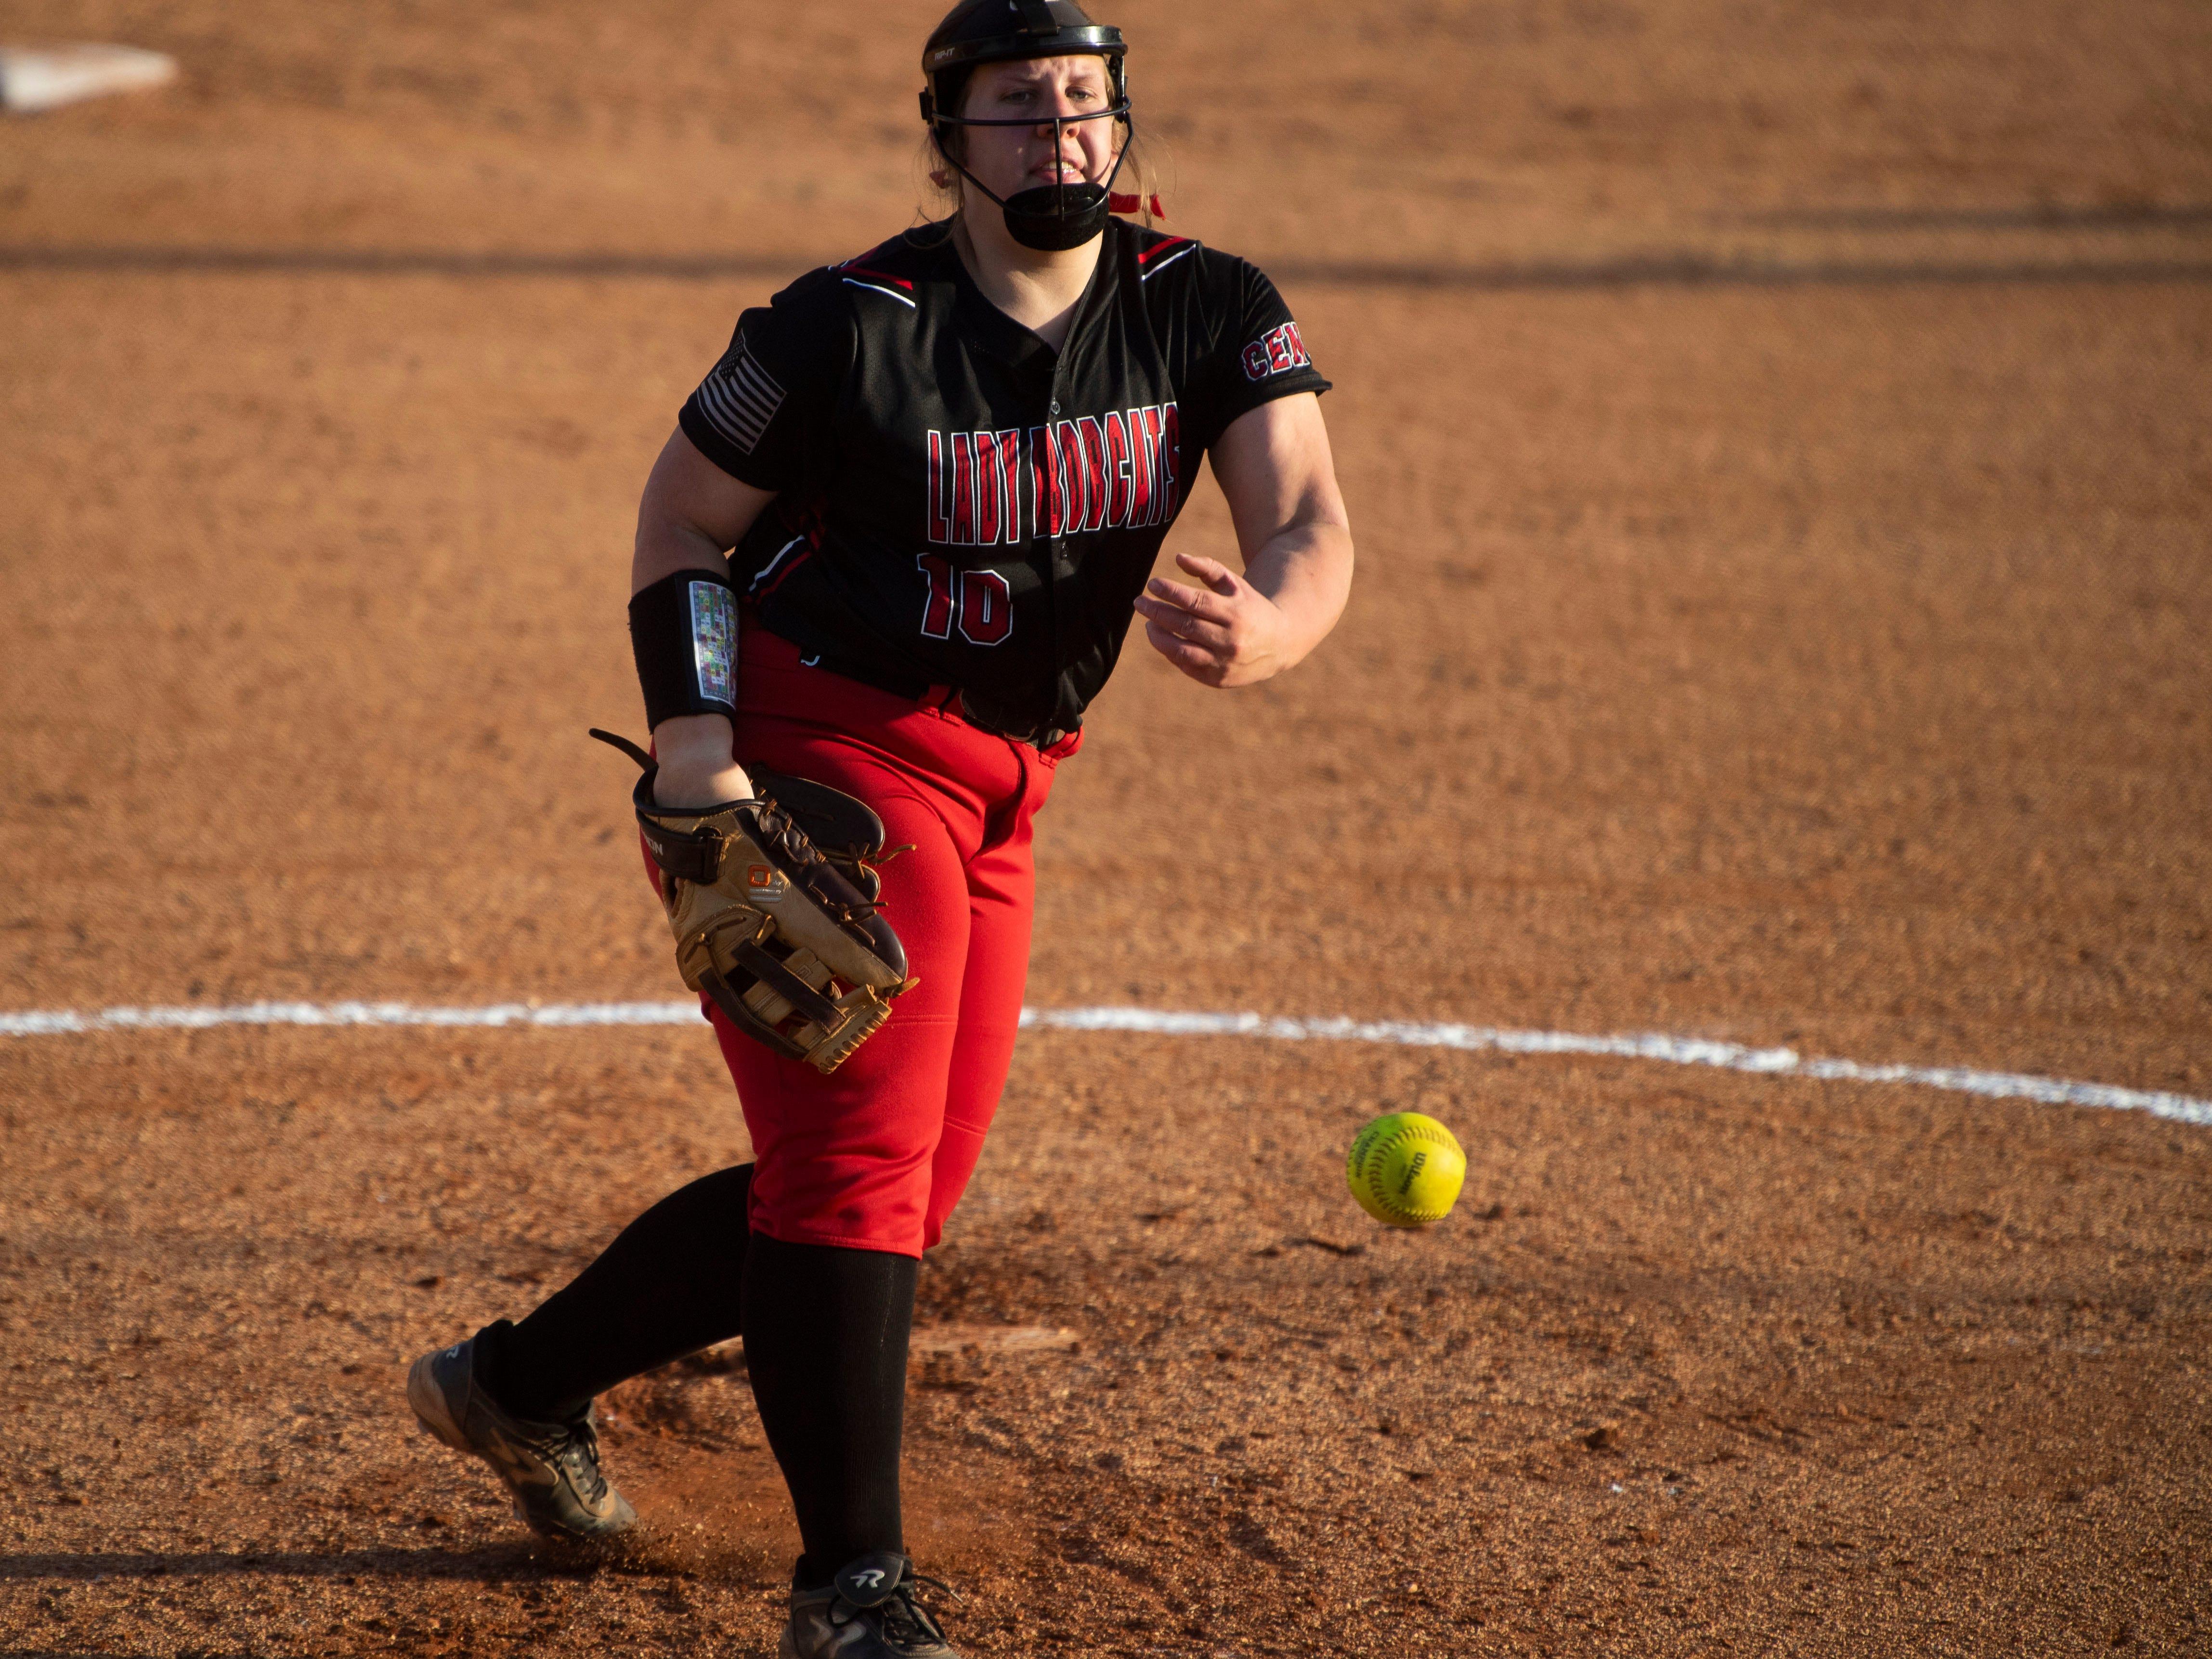 Central's Sarah Hinton (10) pitches against Powell on Thursday, April 11, 2019.